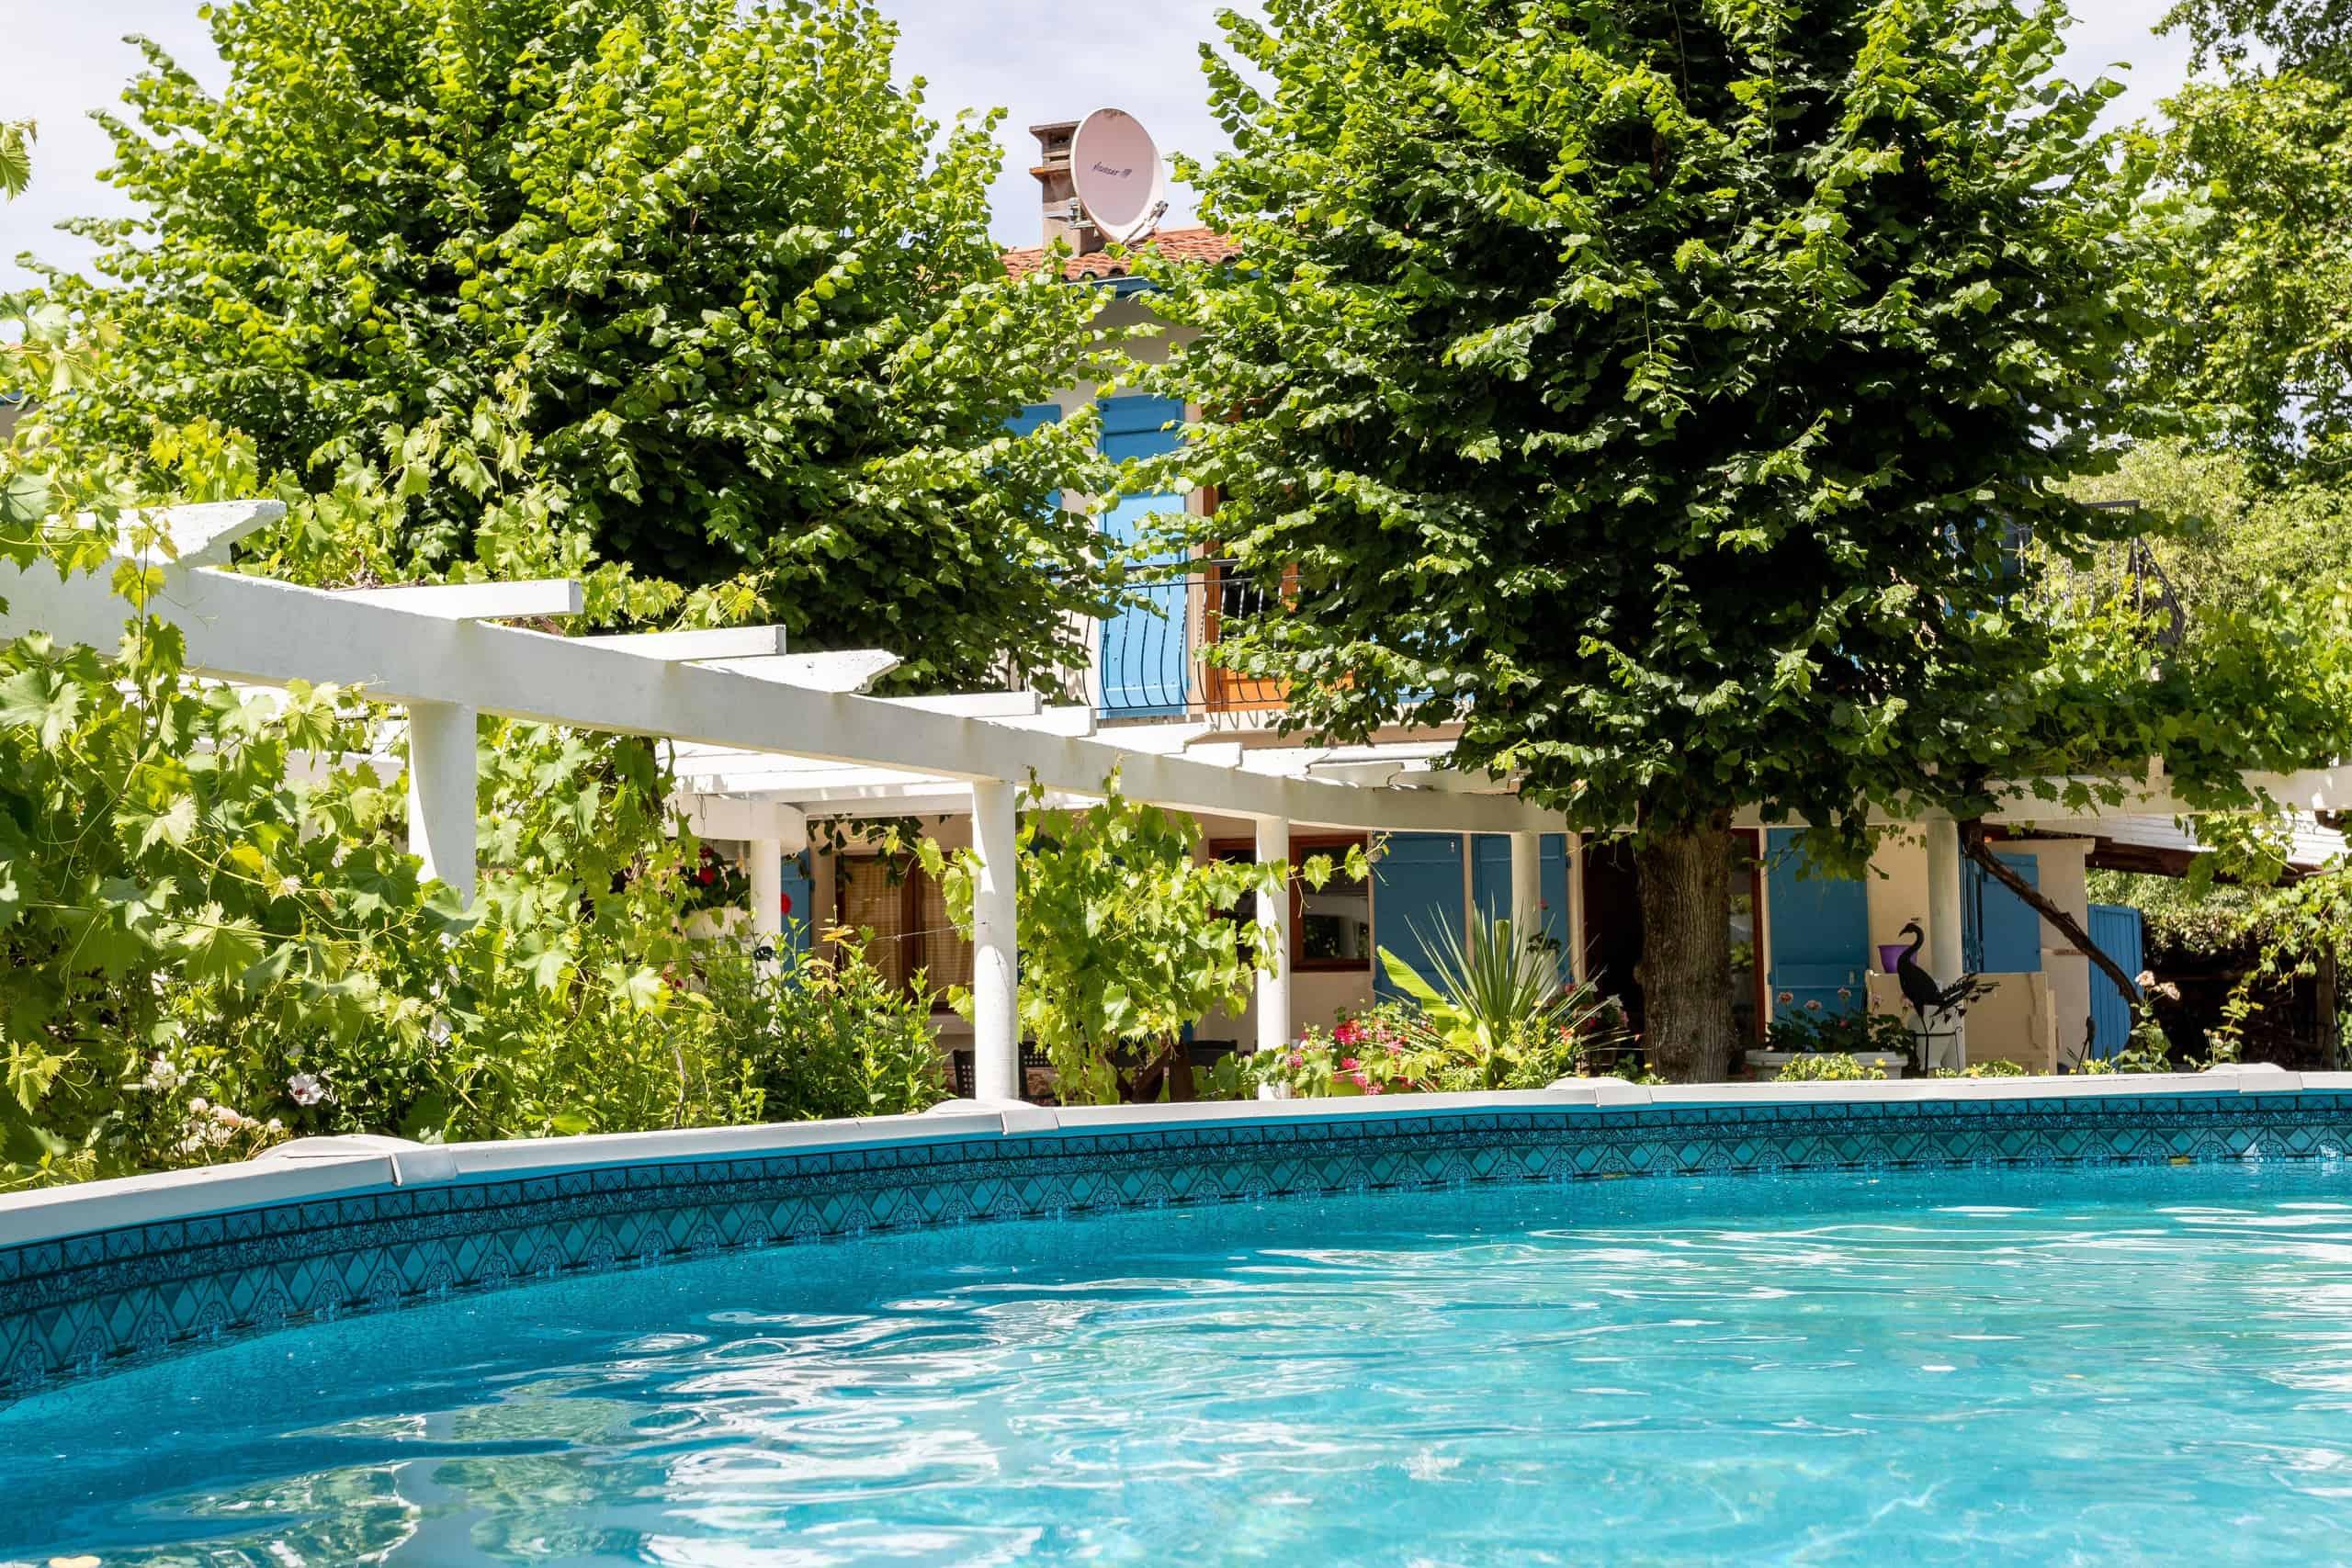 Pool-WMC079